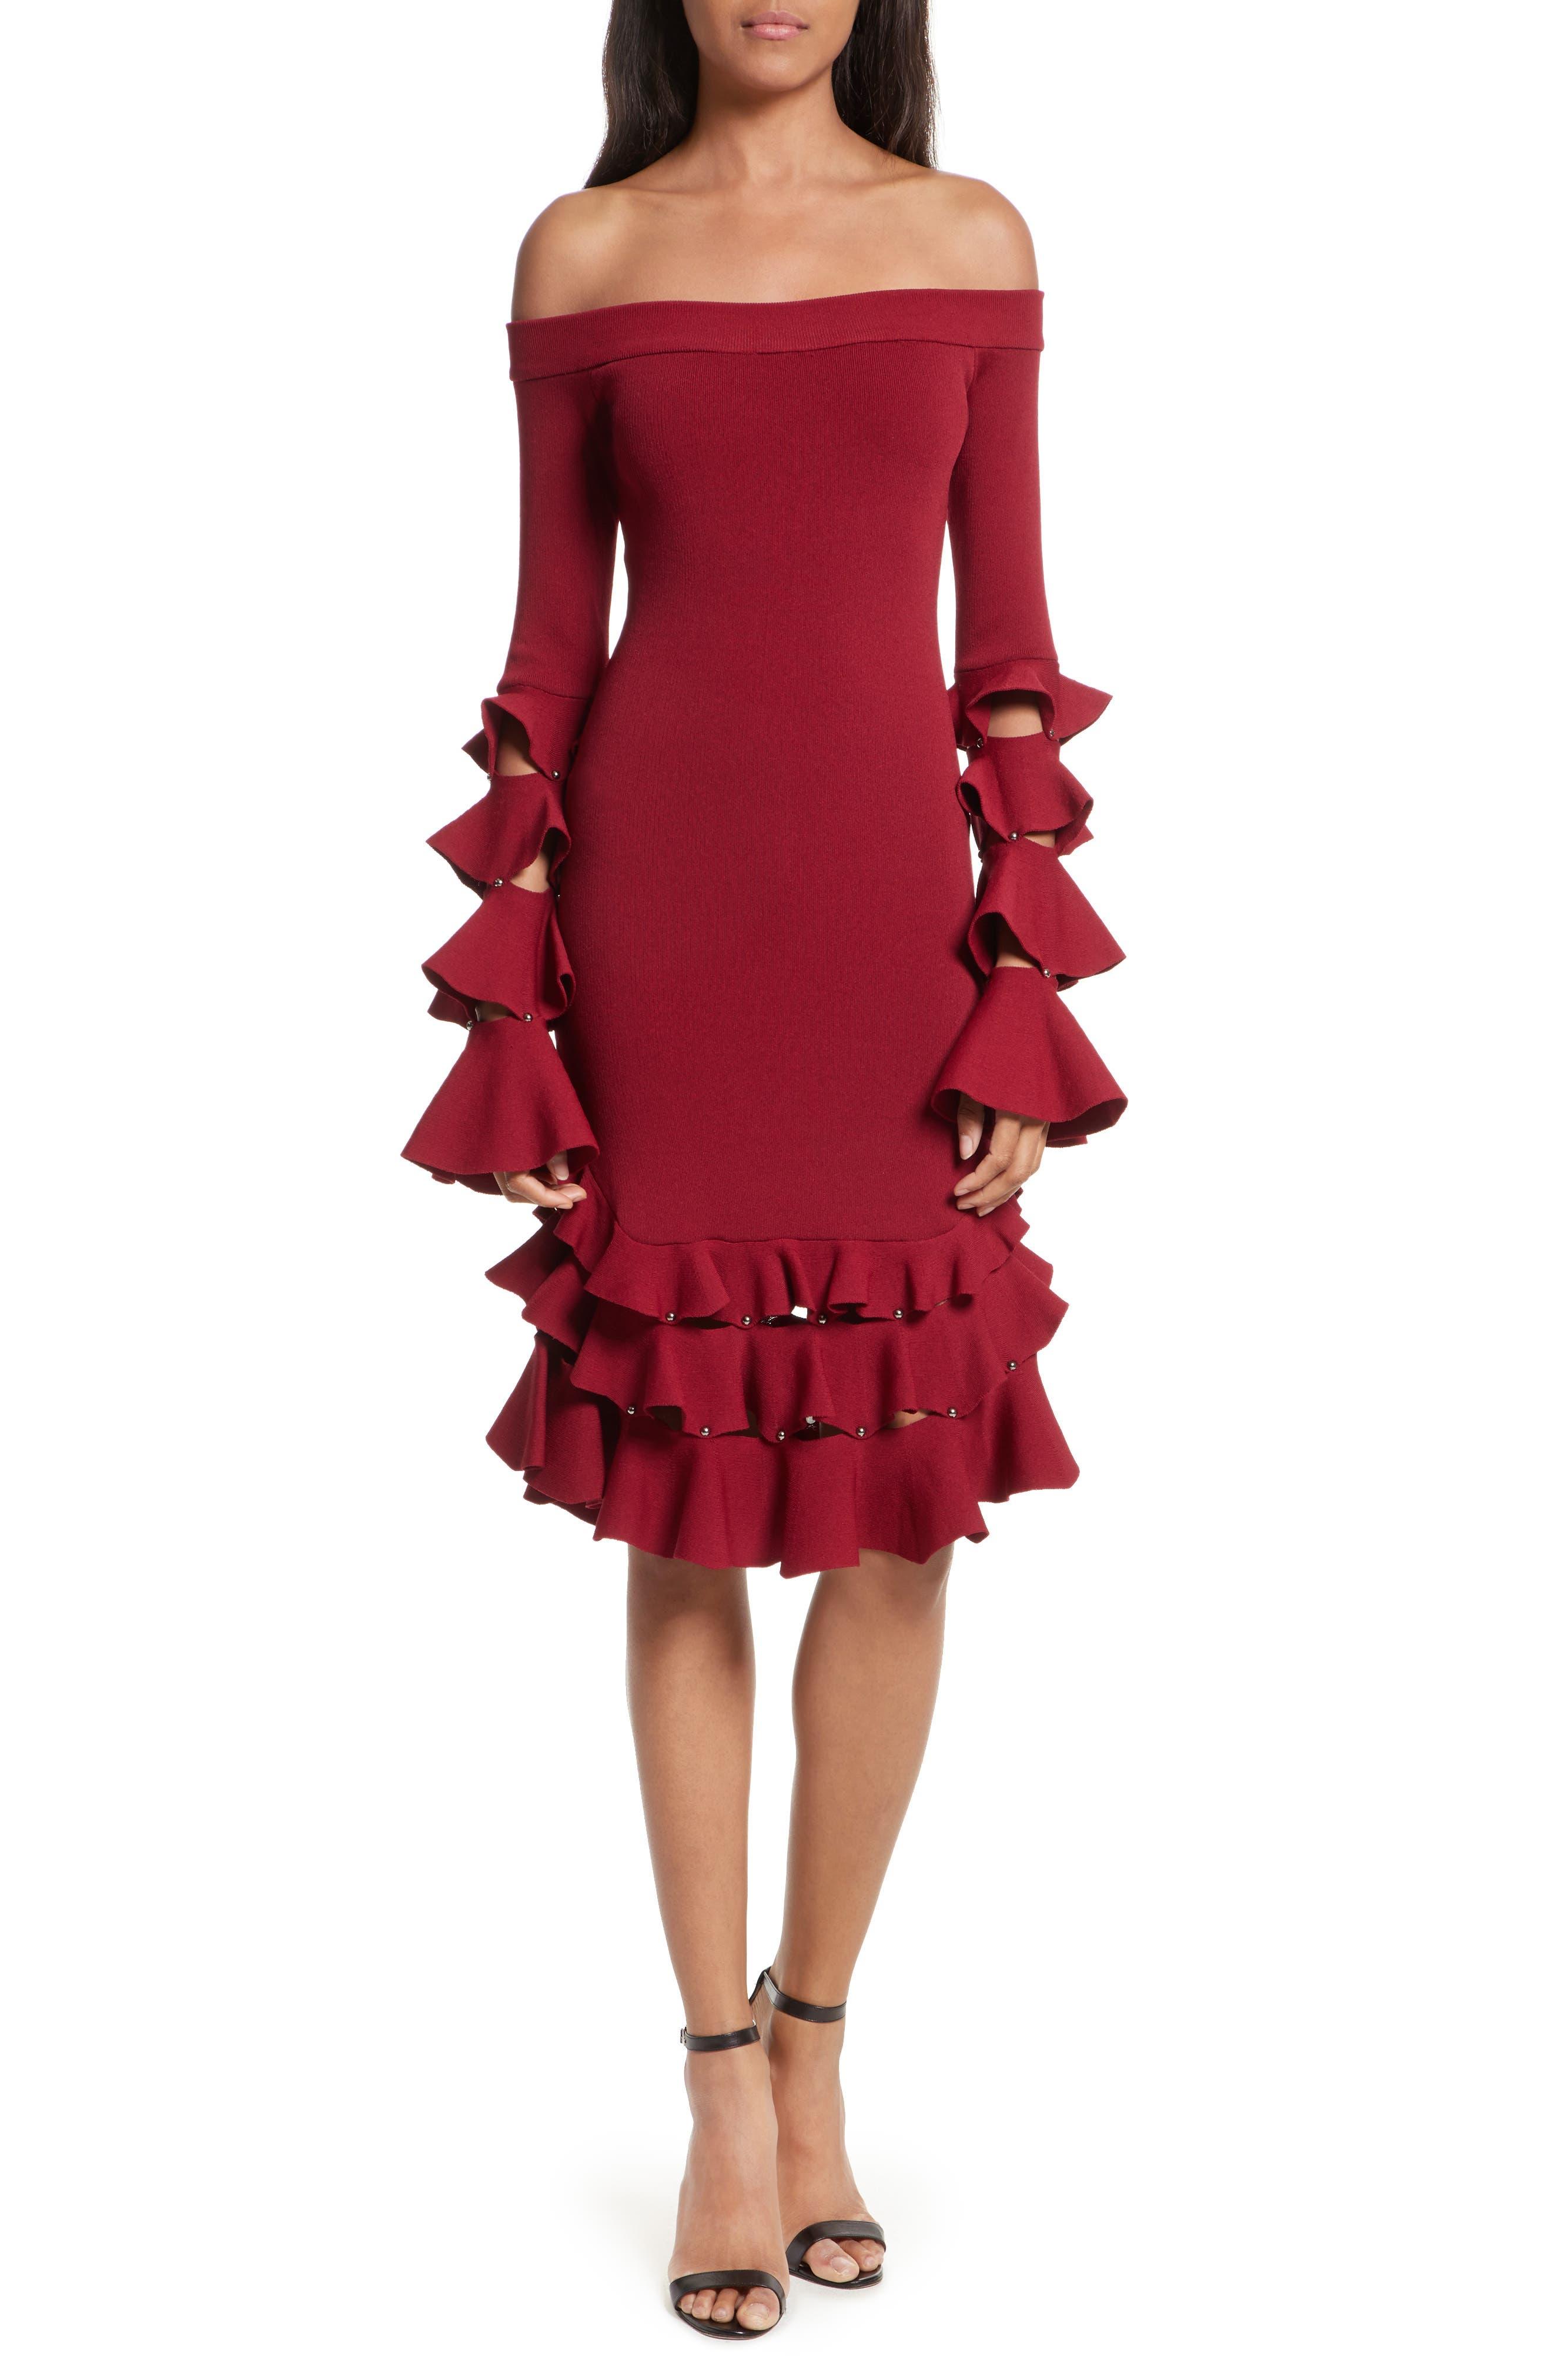 Alternate Image 1 Selected - Jonathan Simkhai Slashed Knit Ruffle Off the Shoulder Dress